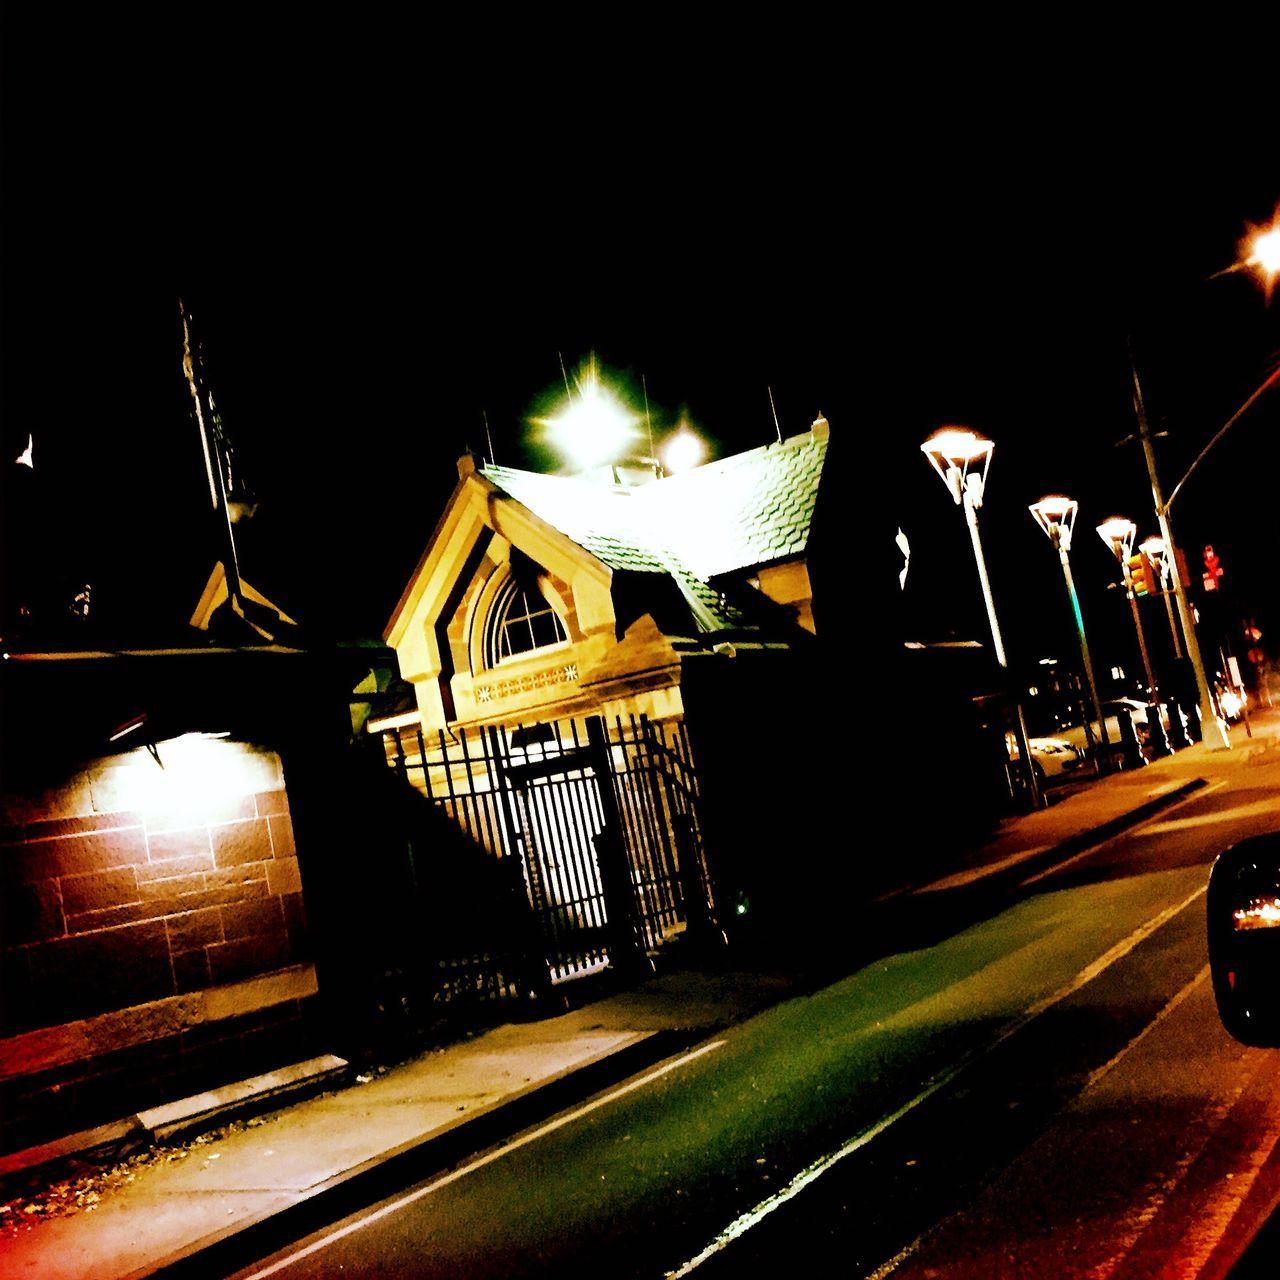 night, illuminated, outdoors, no people, sky